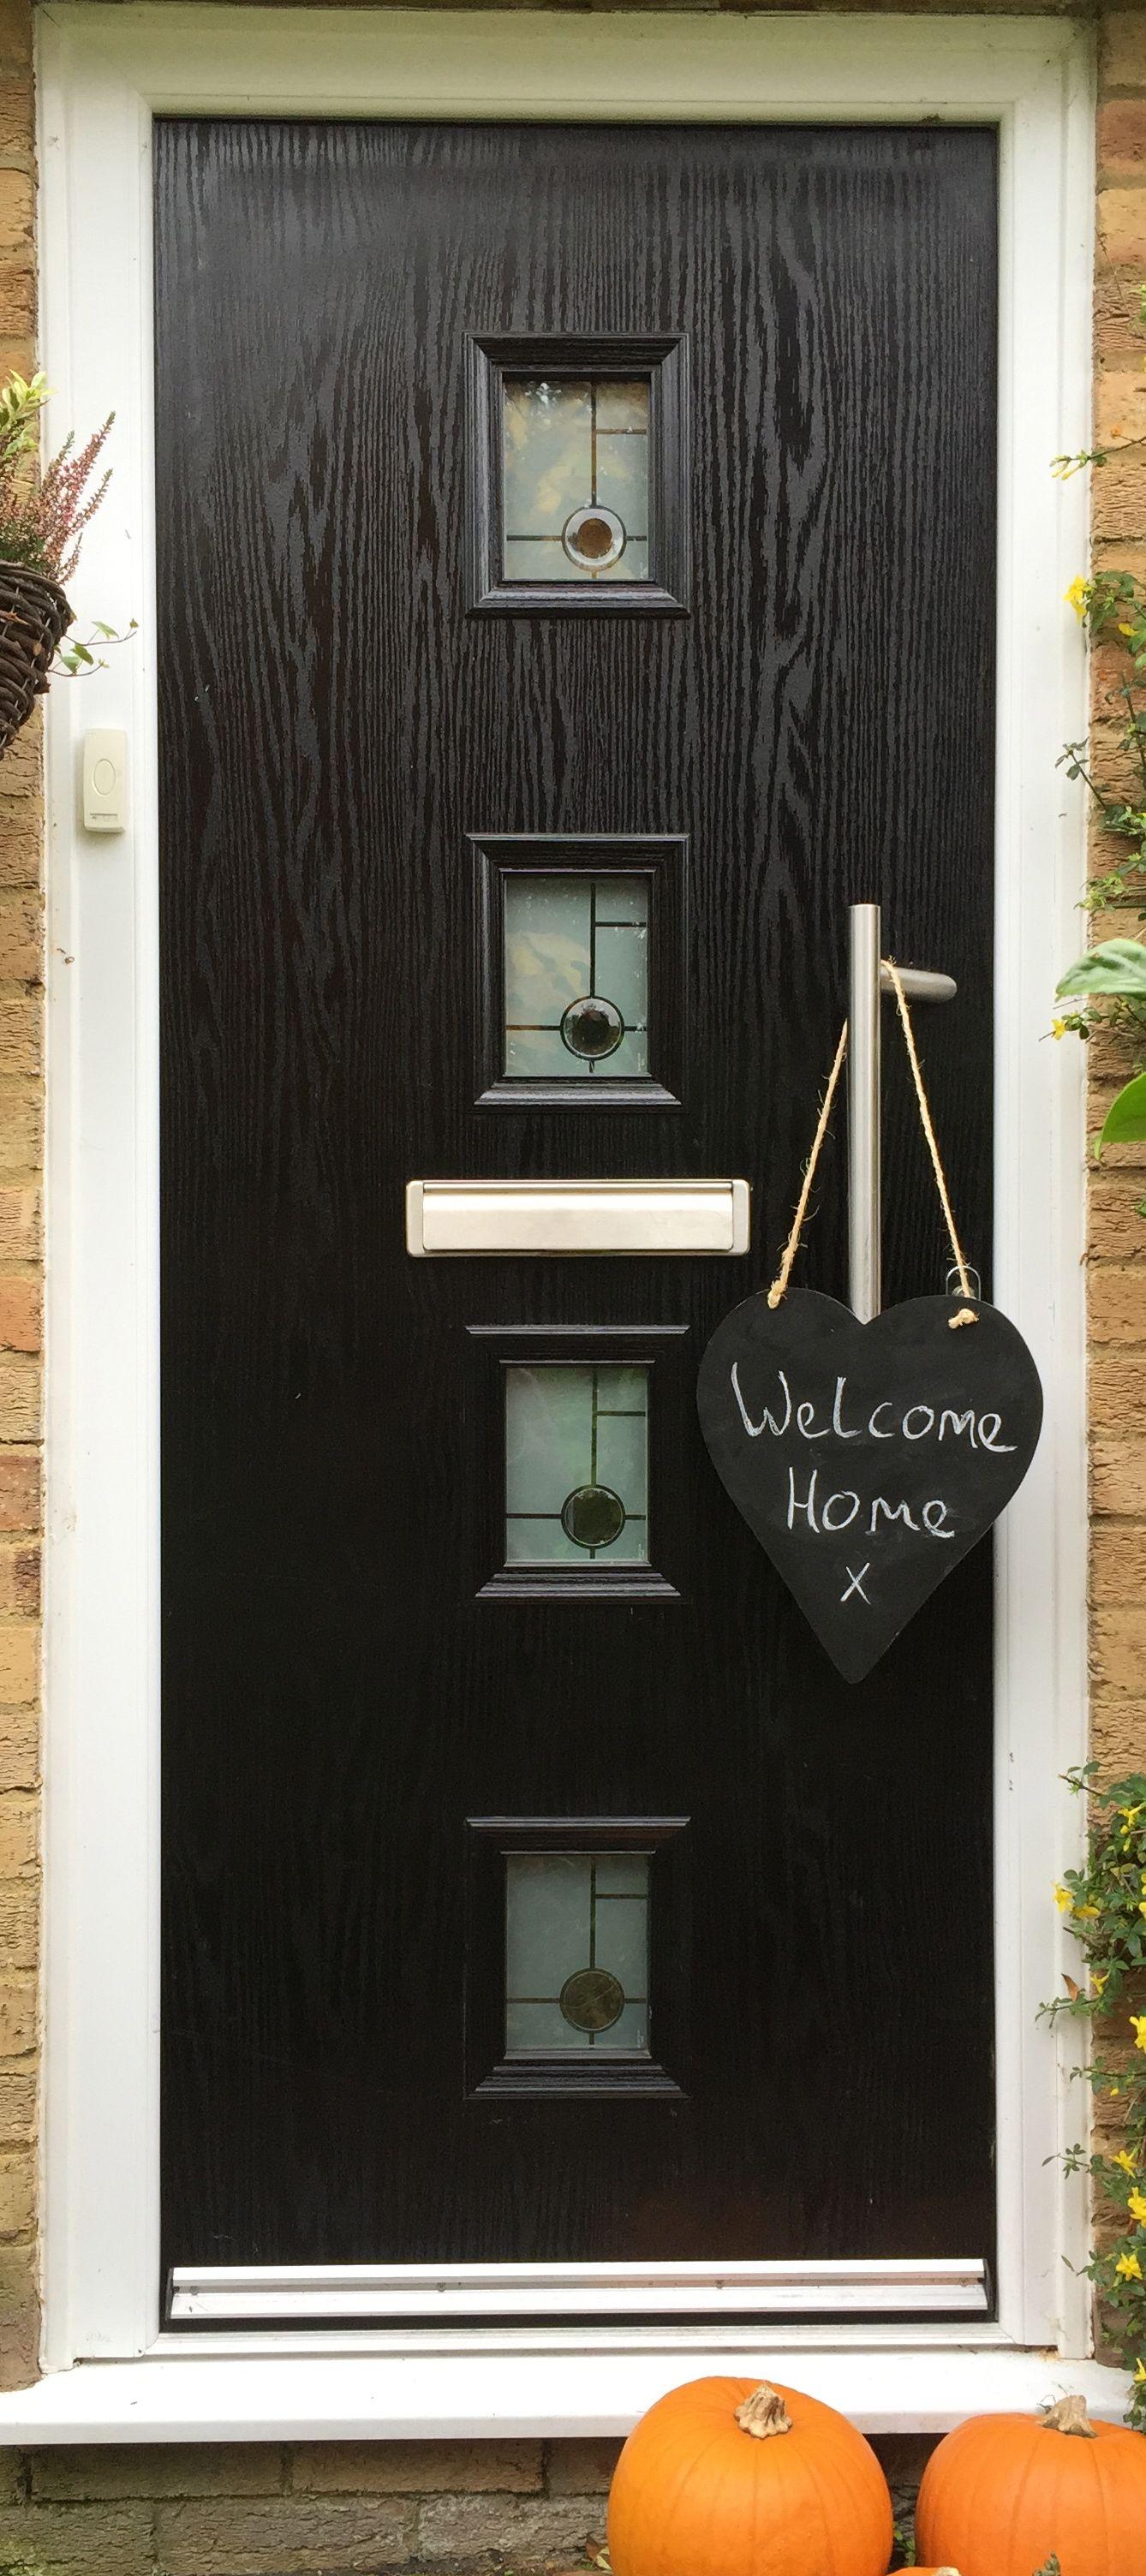 Black Composite Door ready for Halloween! Trick or Treaters will love the warm welcome of an Adoored Composite Door!